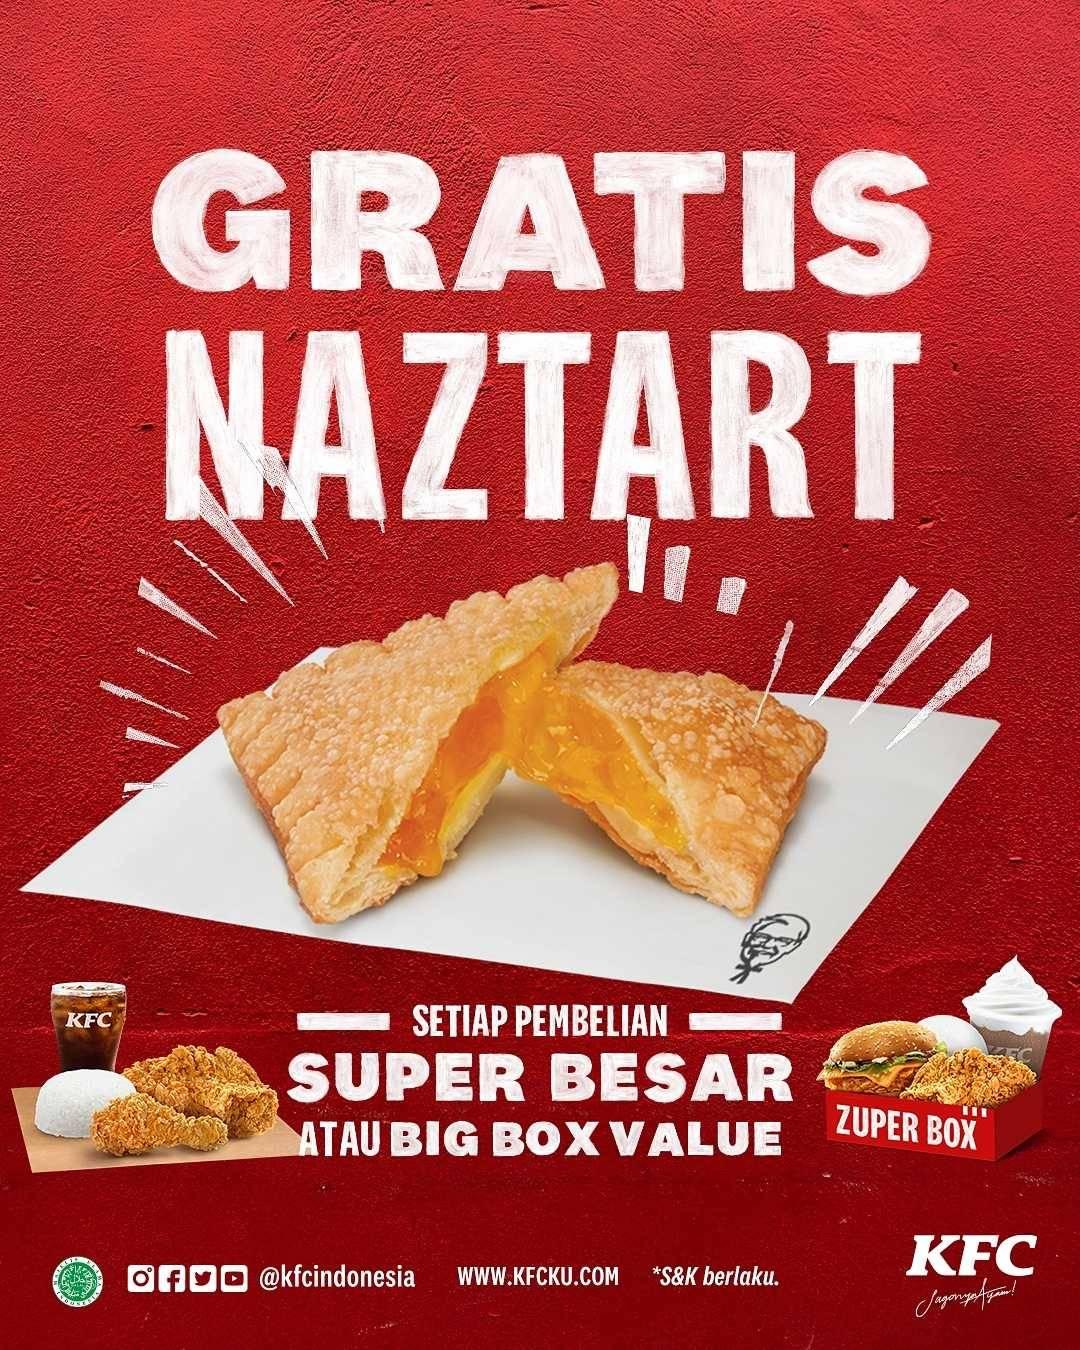 Diskon KFC Promo Beli Super Besar Atau Big Box Value Gratis Naztart